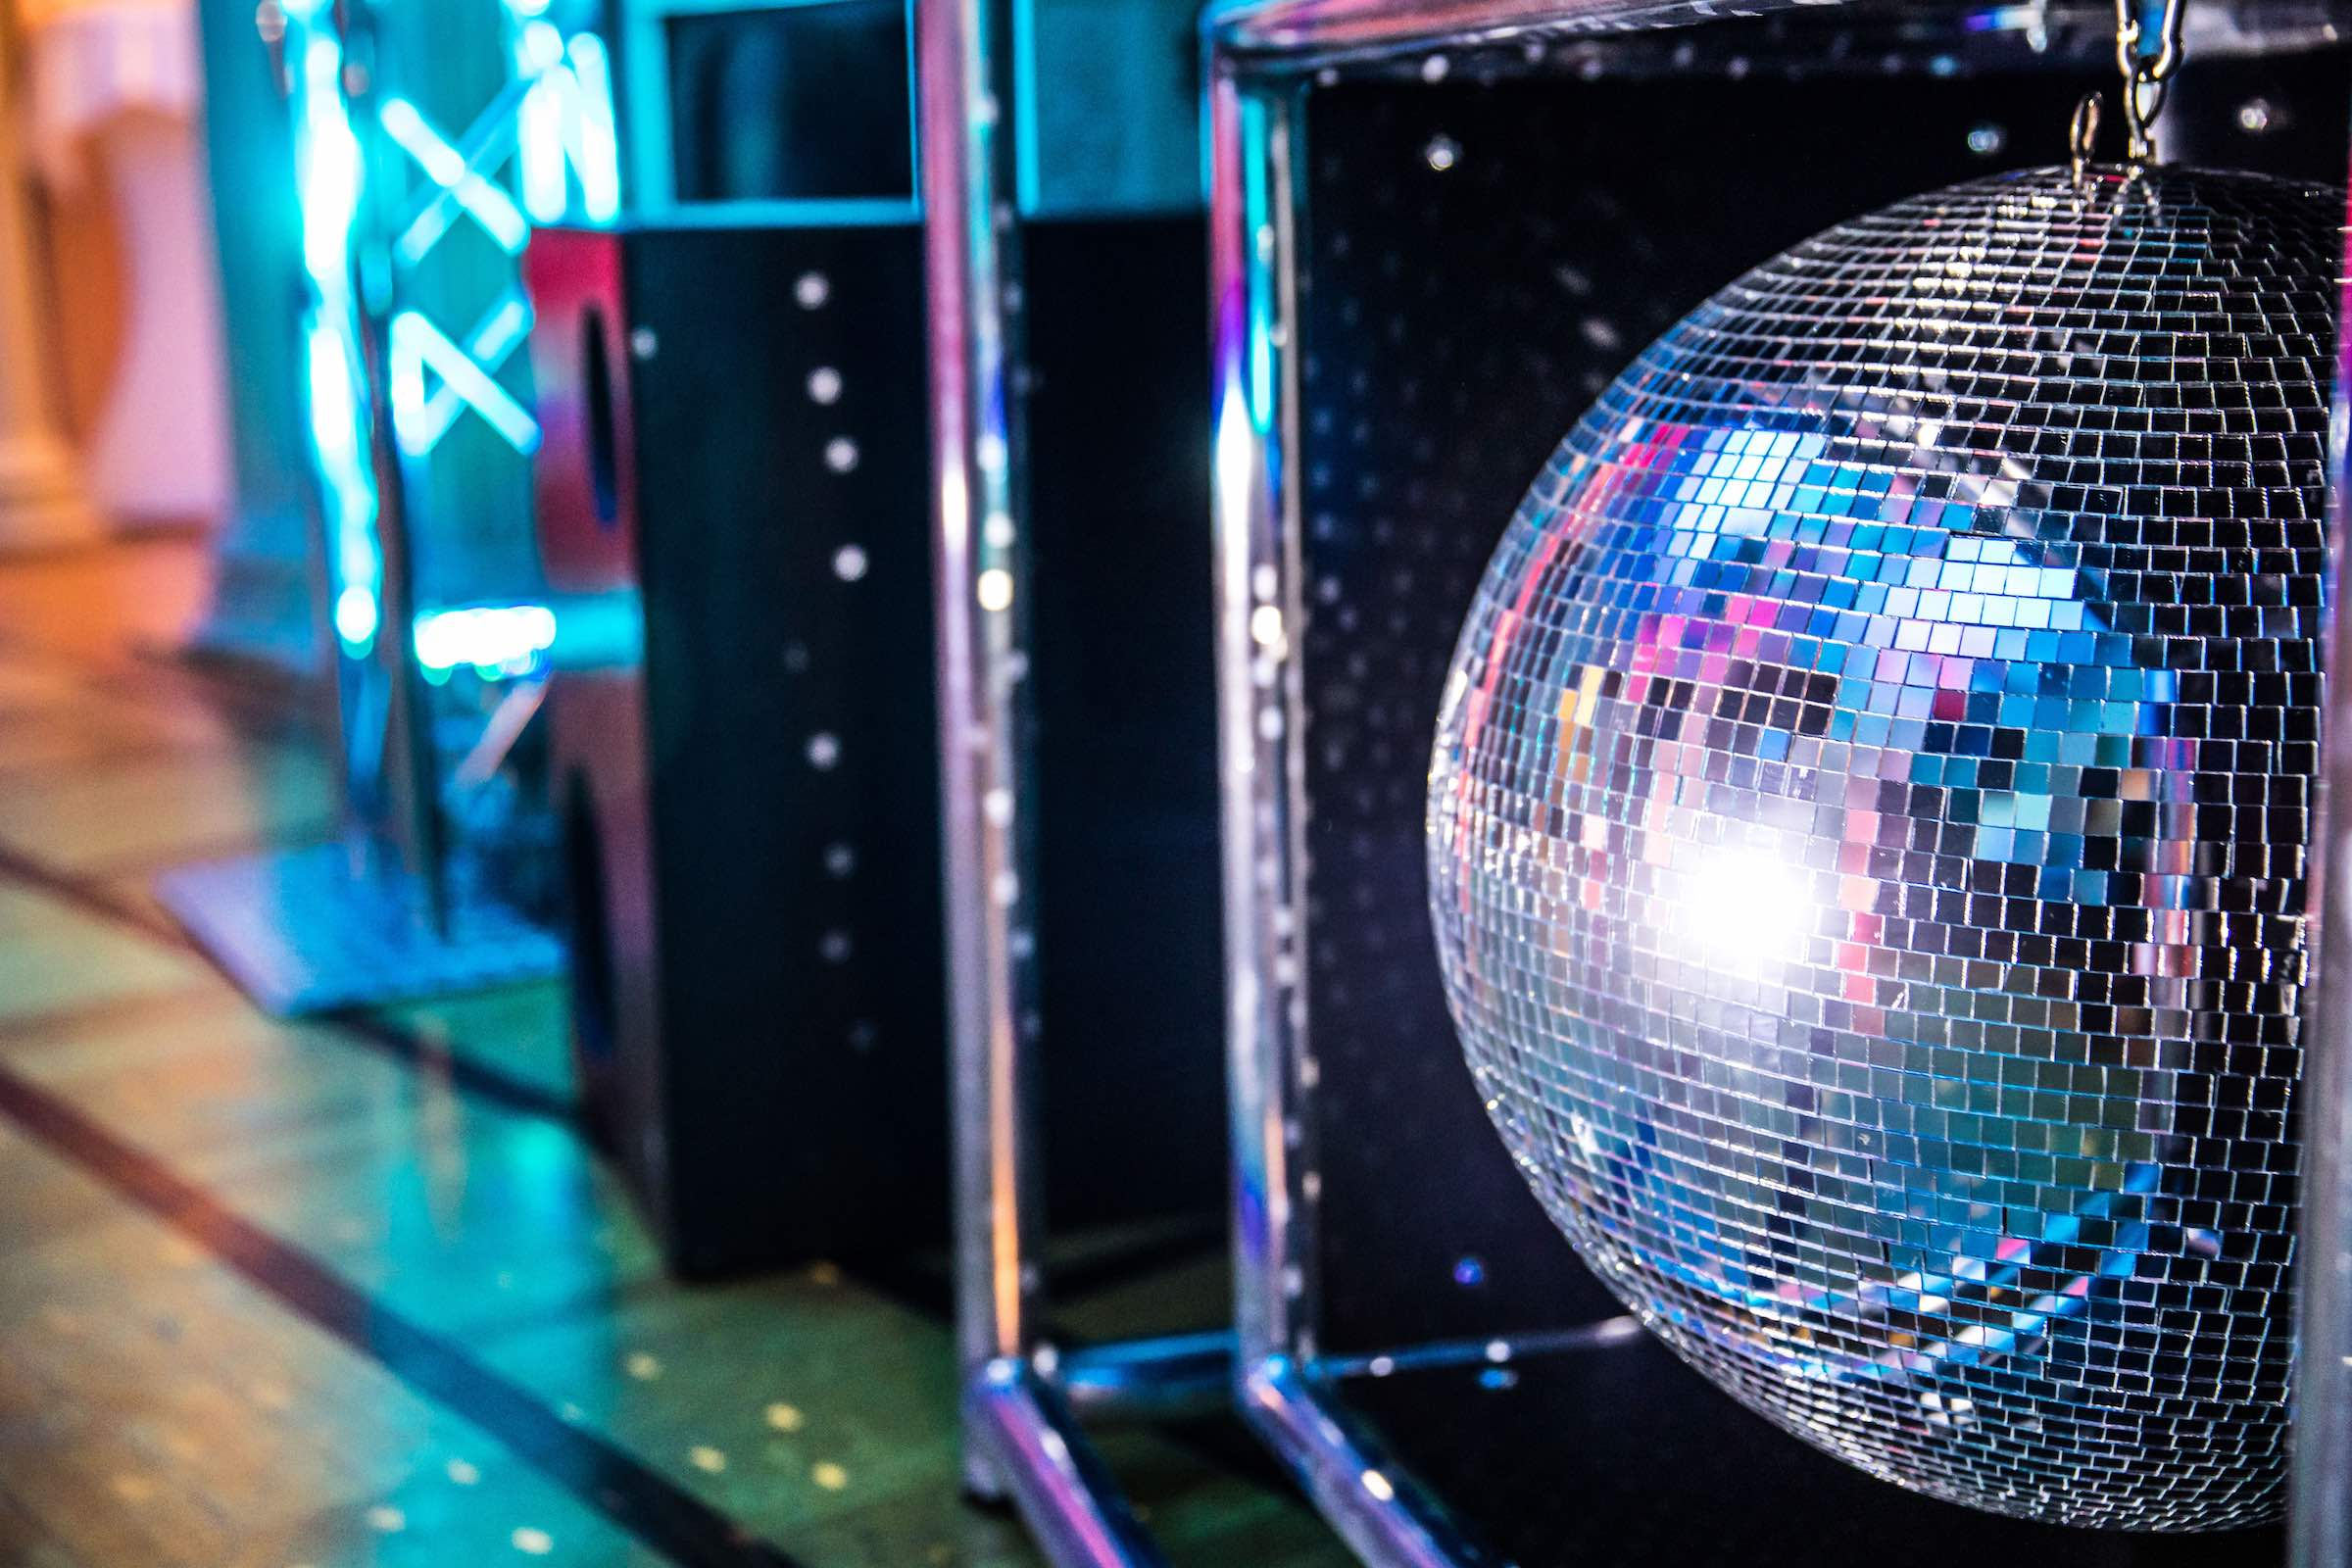 DJ | Technik | Hannover | DJ | Service | DJ | Feier | Hochzeits | DJ | Messe | DJ | Firmenevent | Firmenfeier | DJ | Geburtstag | Discjockey | Weihnachtsfeier | DJ | Sommerfest | Event | Buchen | Mieten | Lehmann | Eventservice